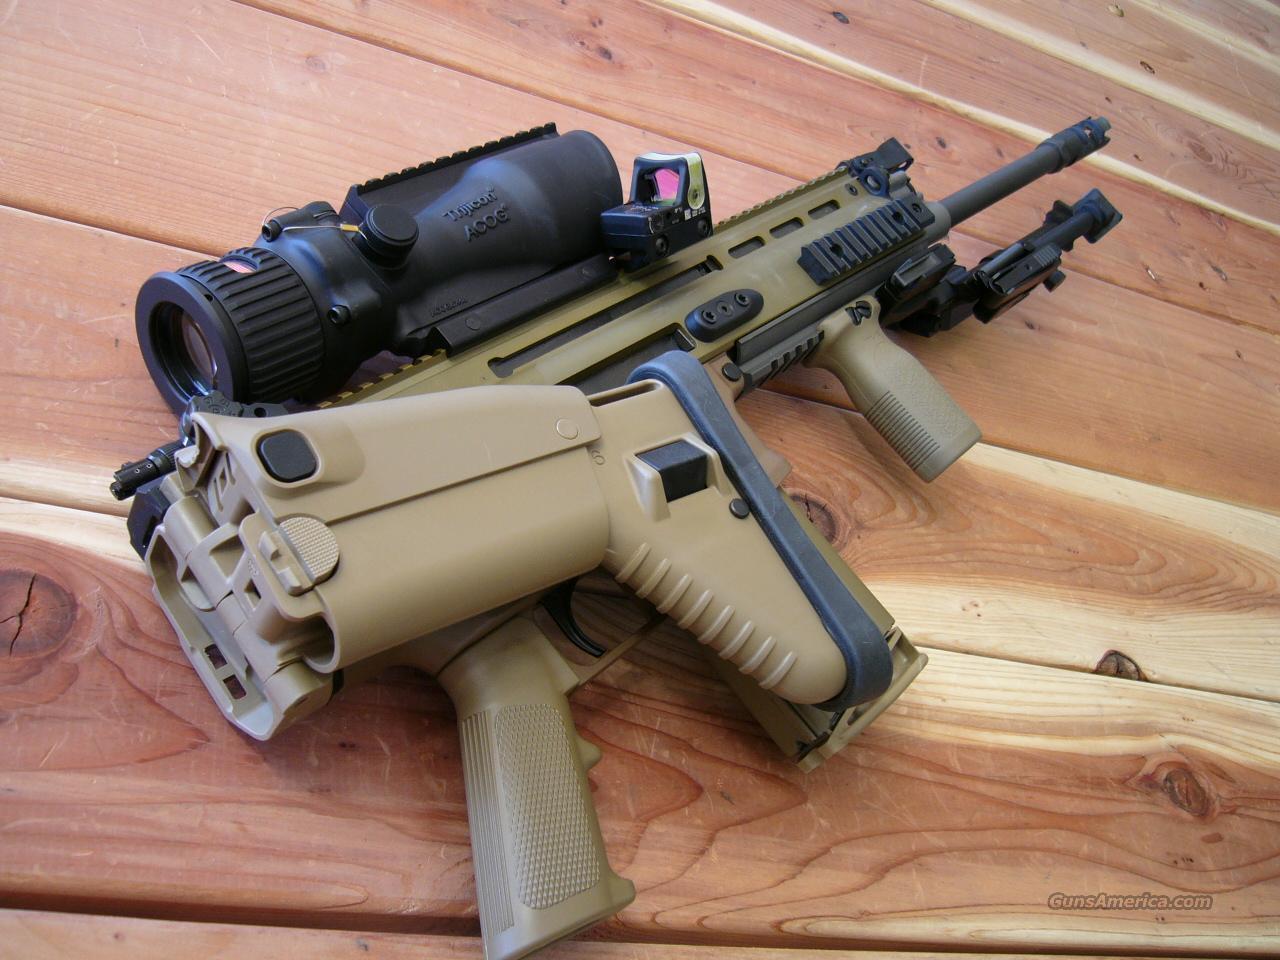 RANGER DEPLOY SCAR-H MK17 MOD 0 FNH 17S FN SCAR  308 7 62 TRIJICON ACOG  GEISSELE MAGPUL